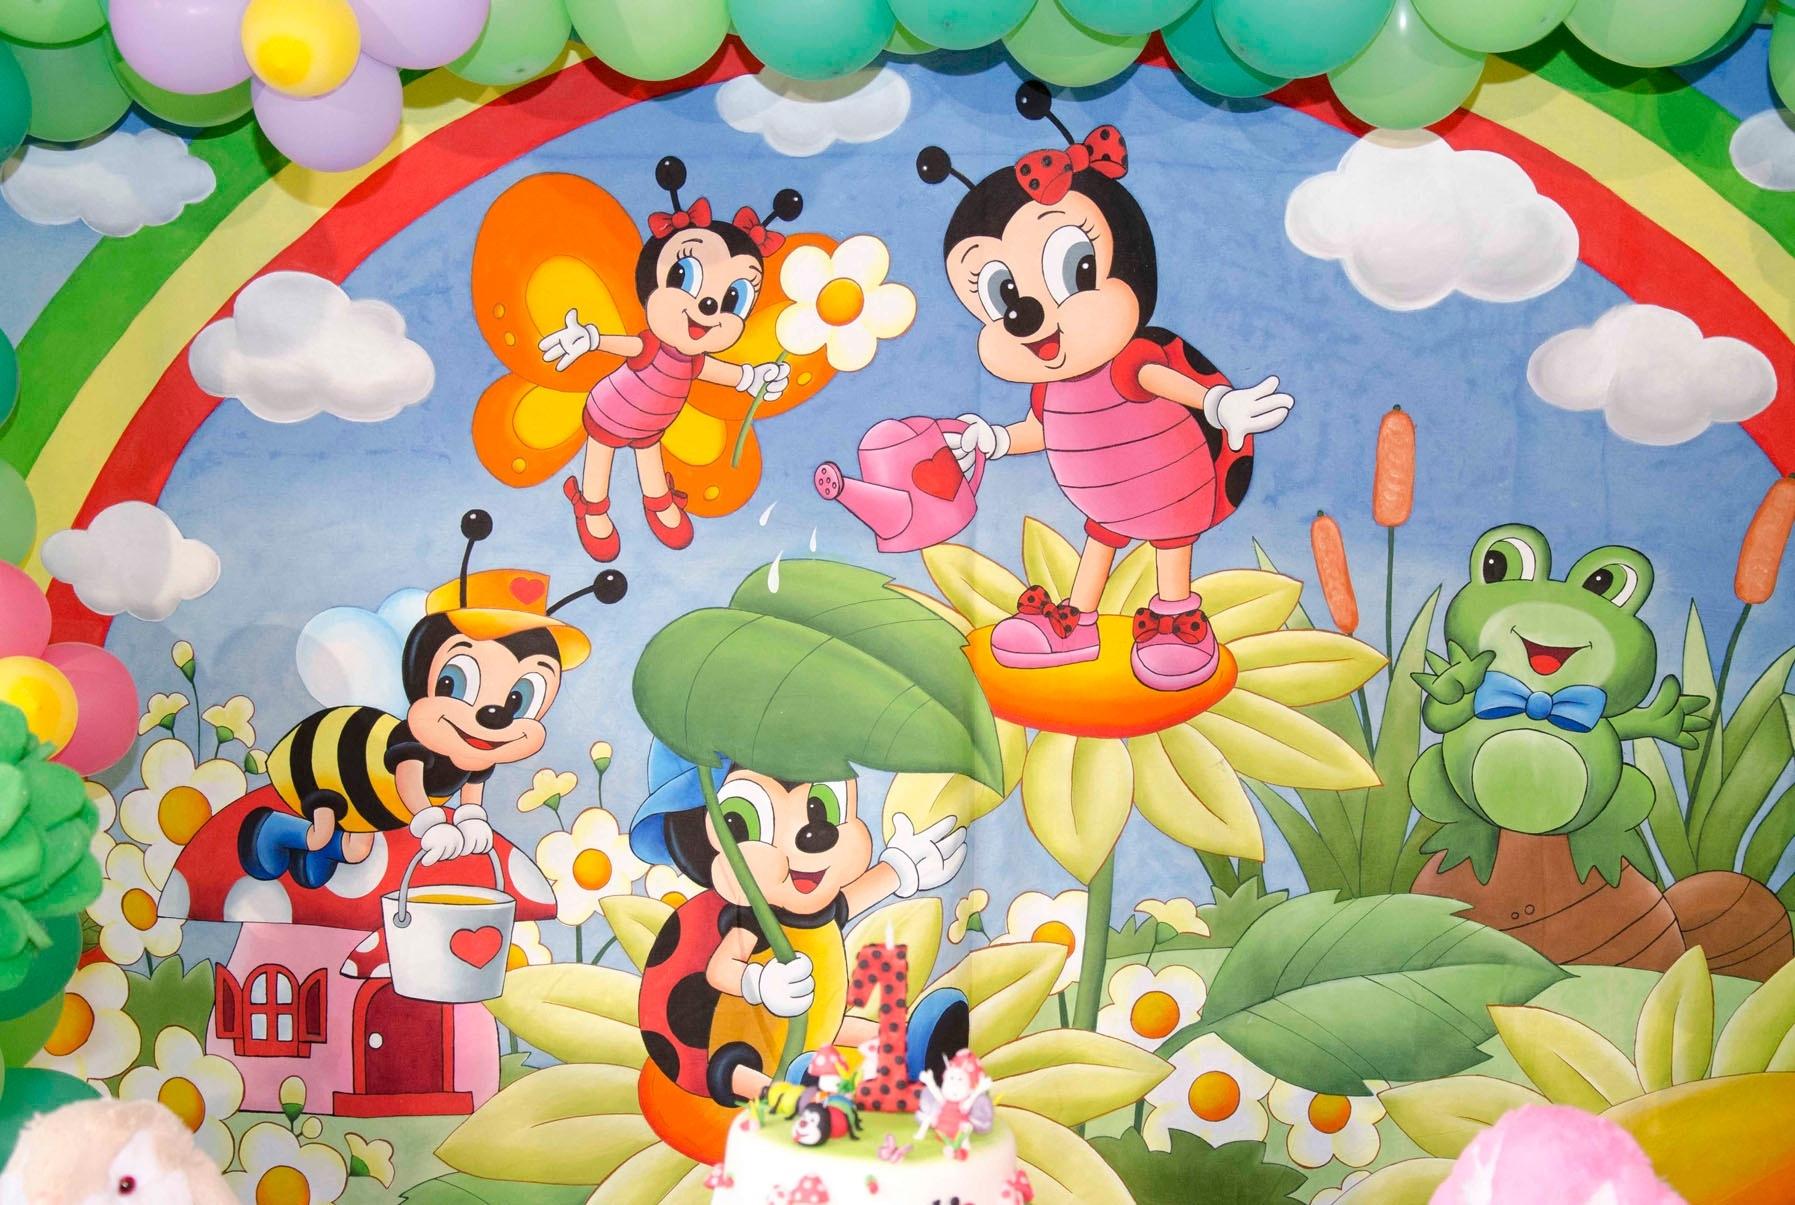 decoracao jardim encantado festa infantil:Jardim encantado